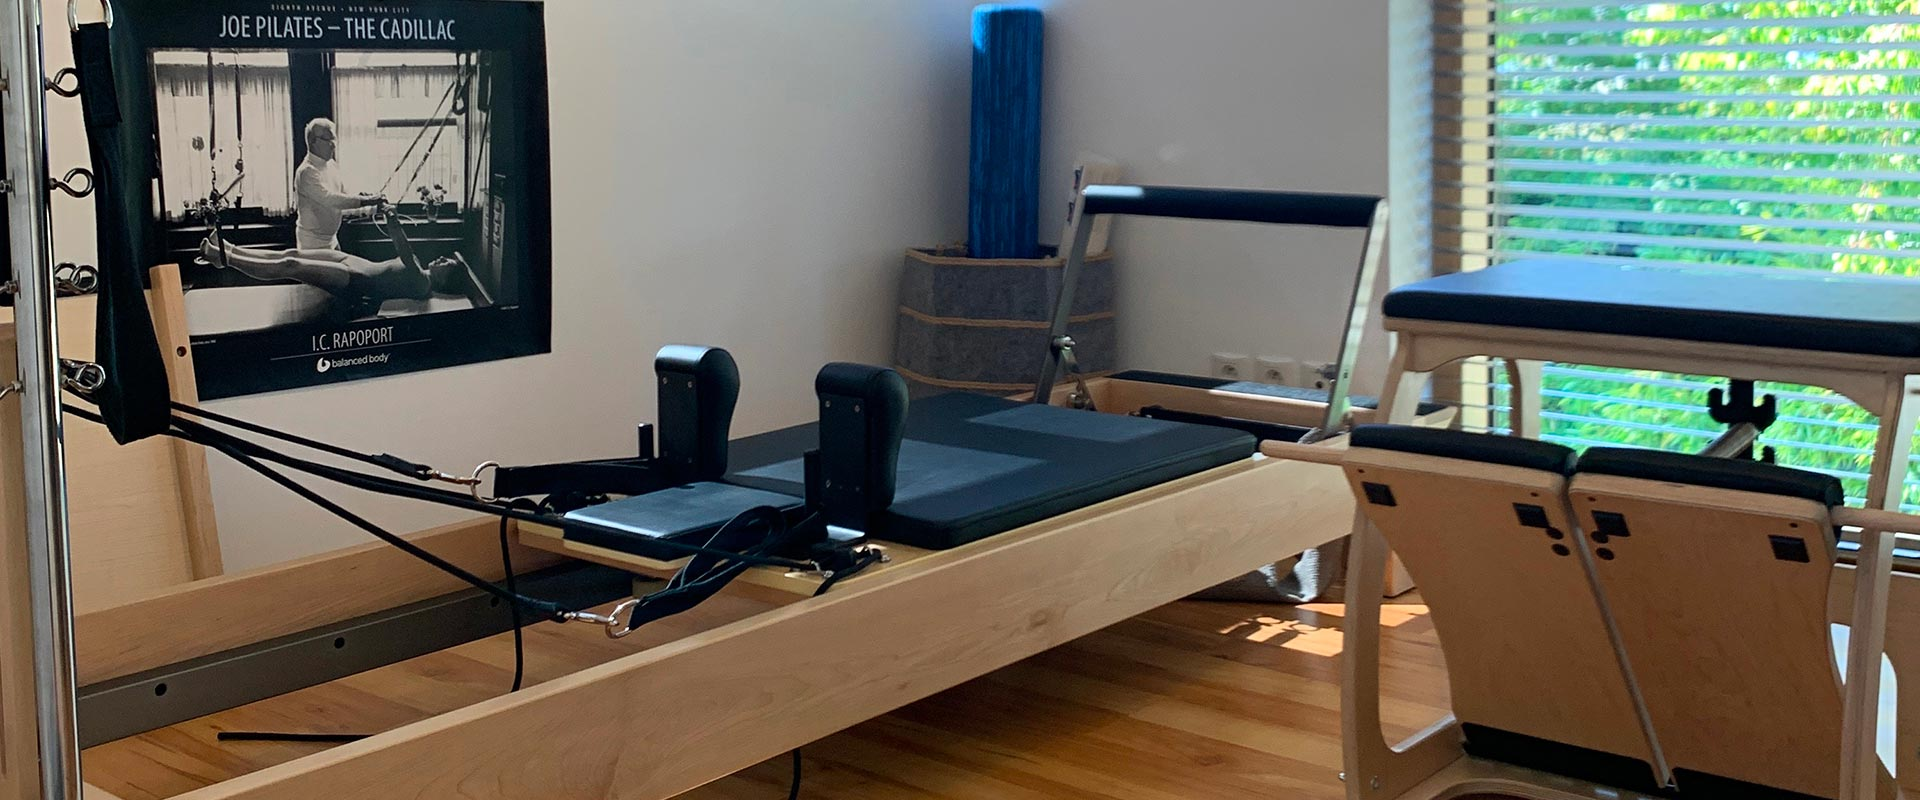 salle musculation et fitness à Brest